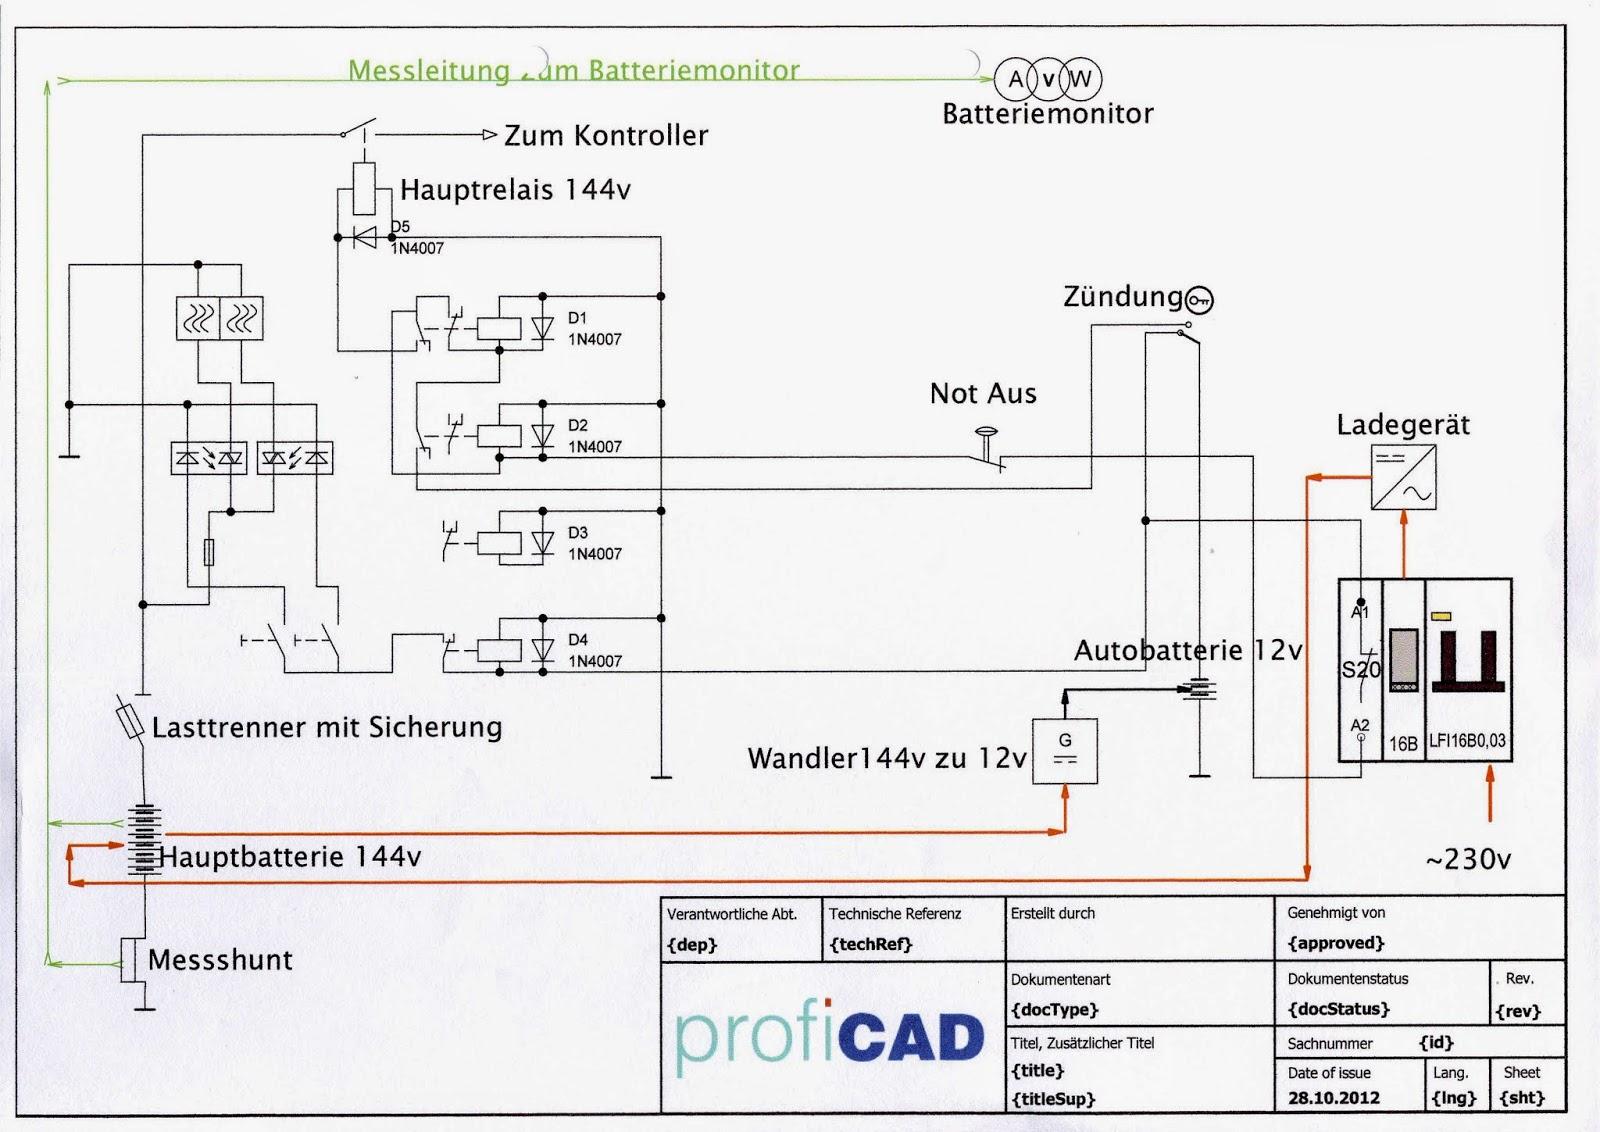 vw polo 6n2 radio wiring diagram sony xplod mex bt2900 zpm zero mobil elektro